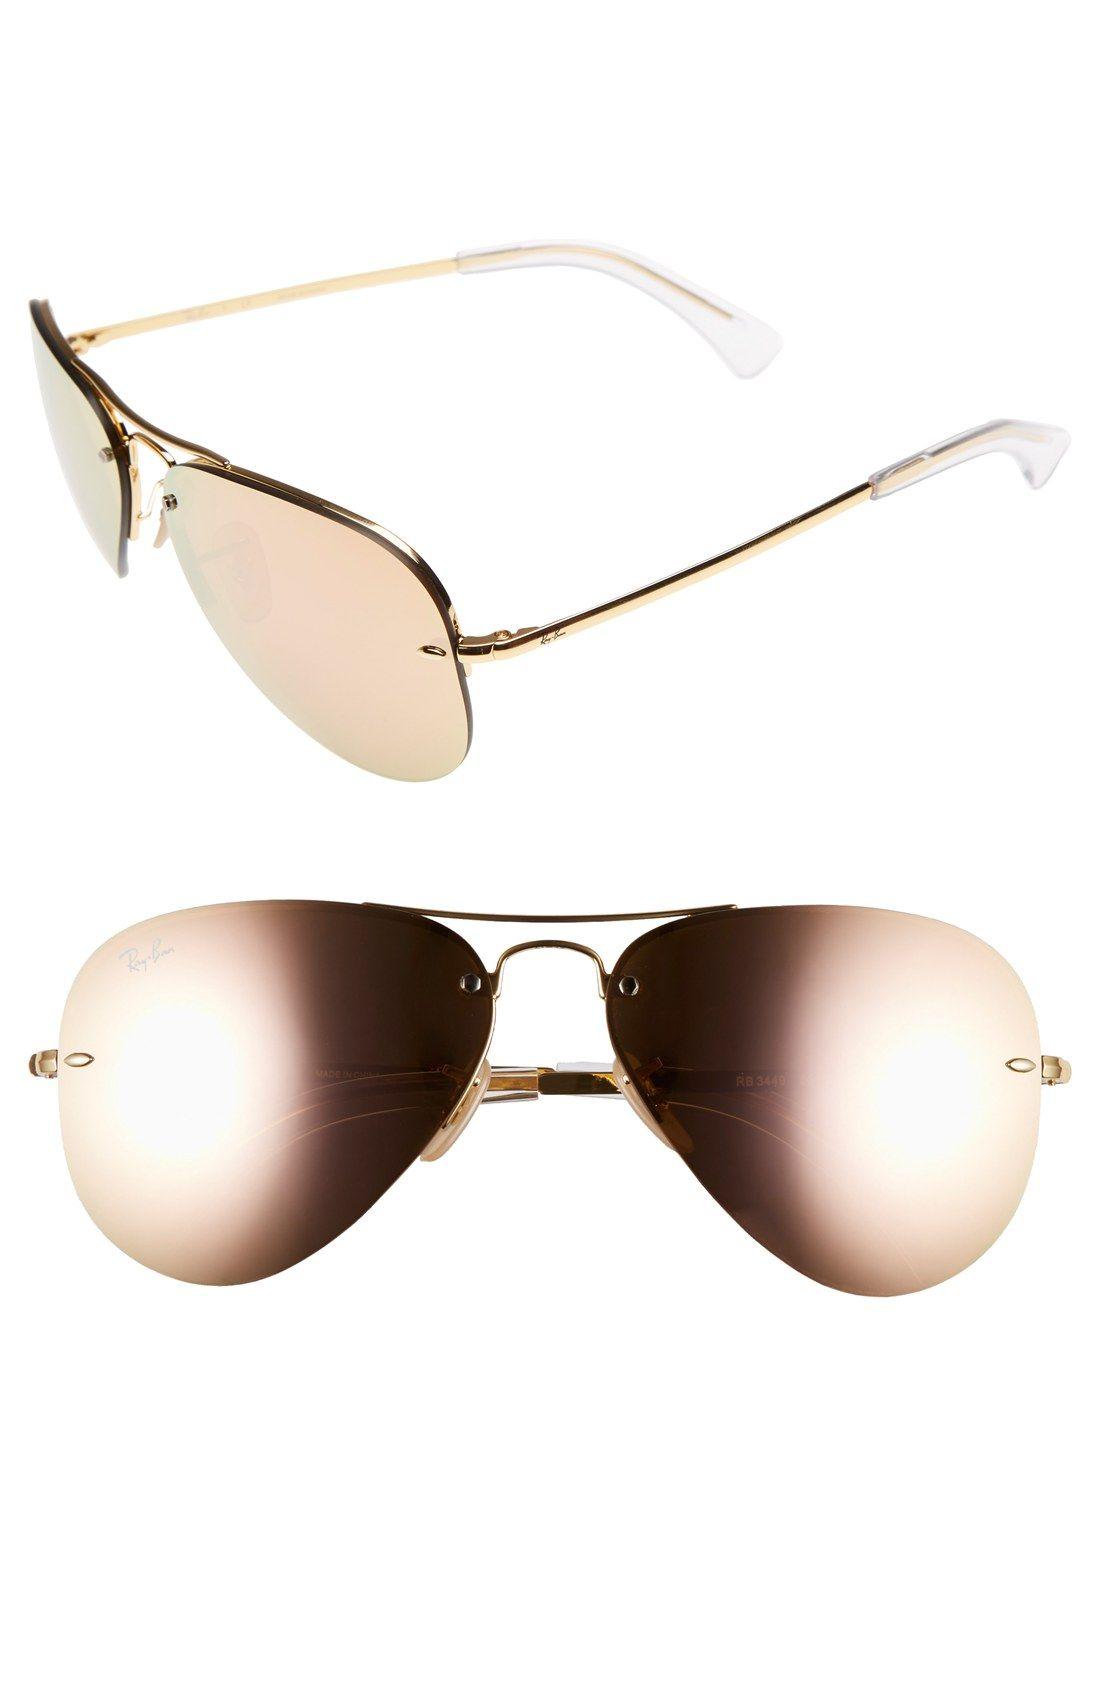 d6a867e027fd Ray-Ban 59mm Semi Rimless Aviator Sunglasses in Brown Pink